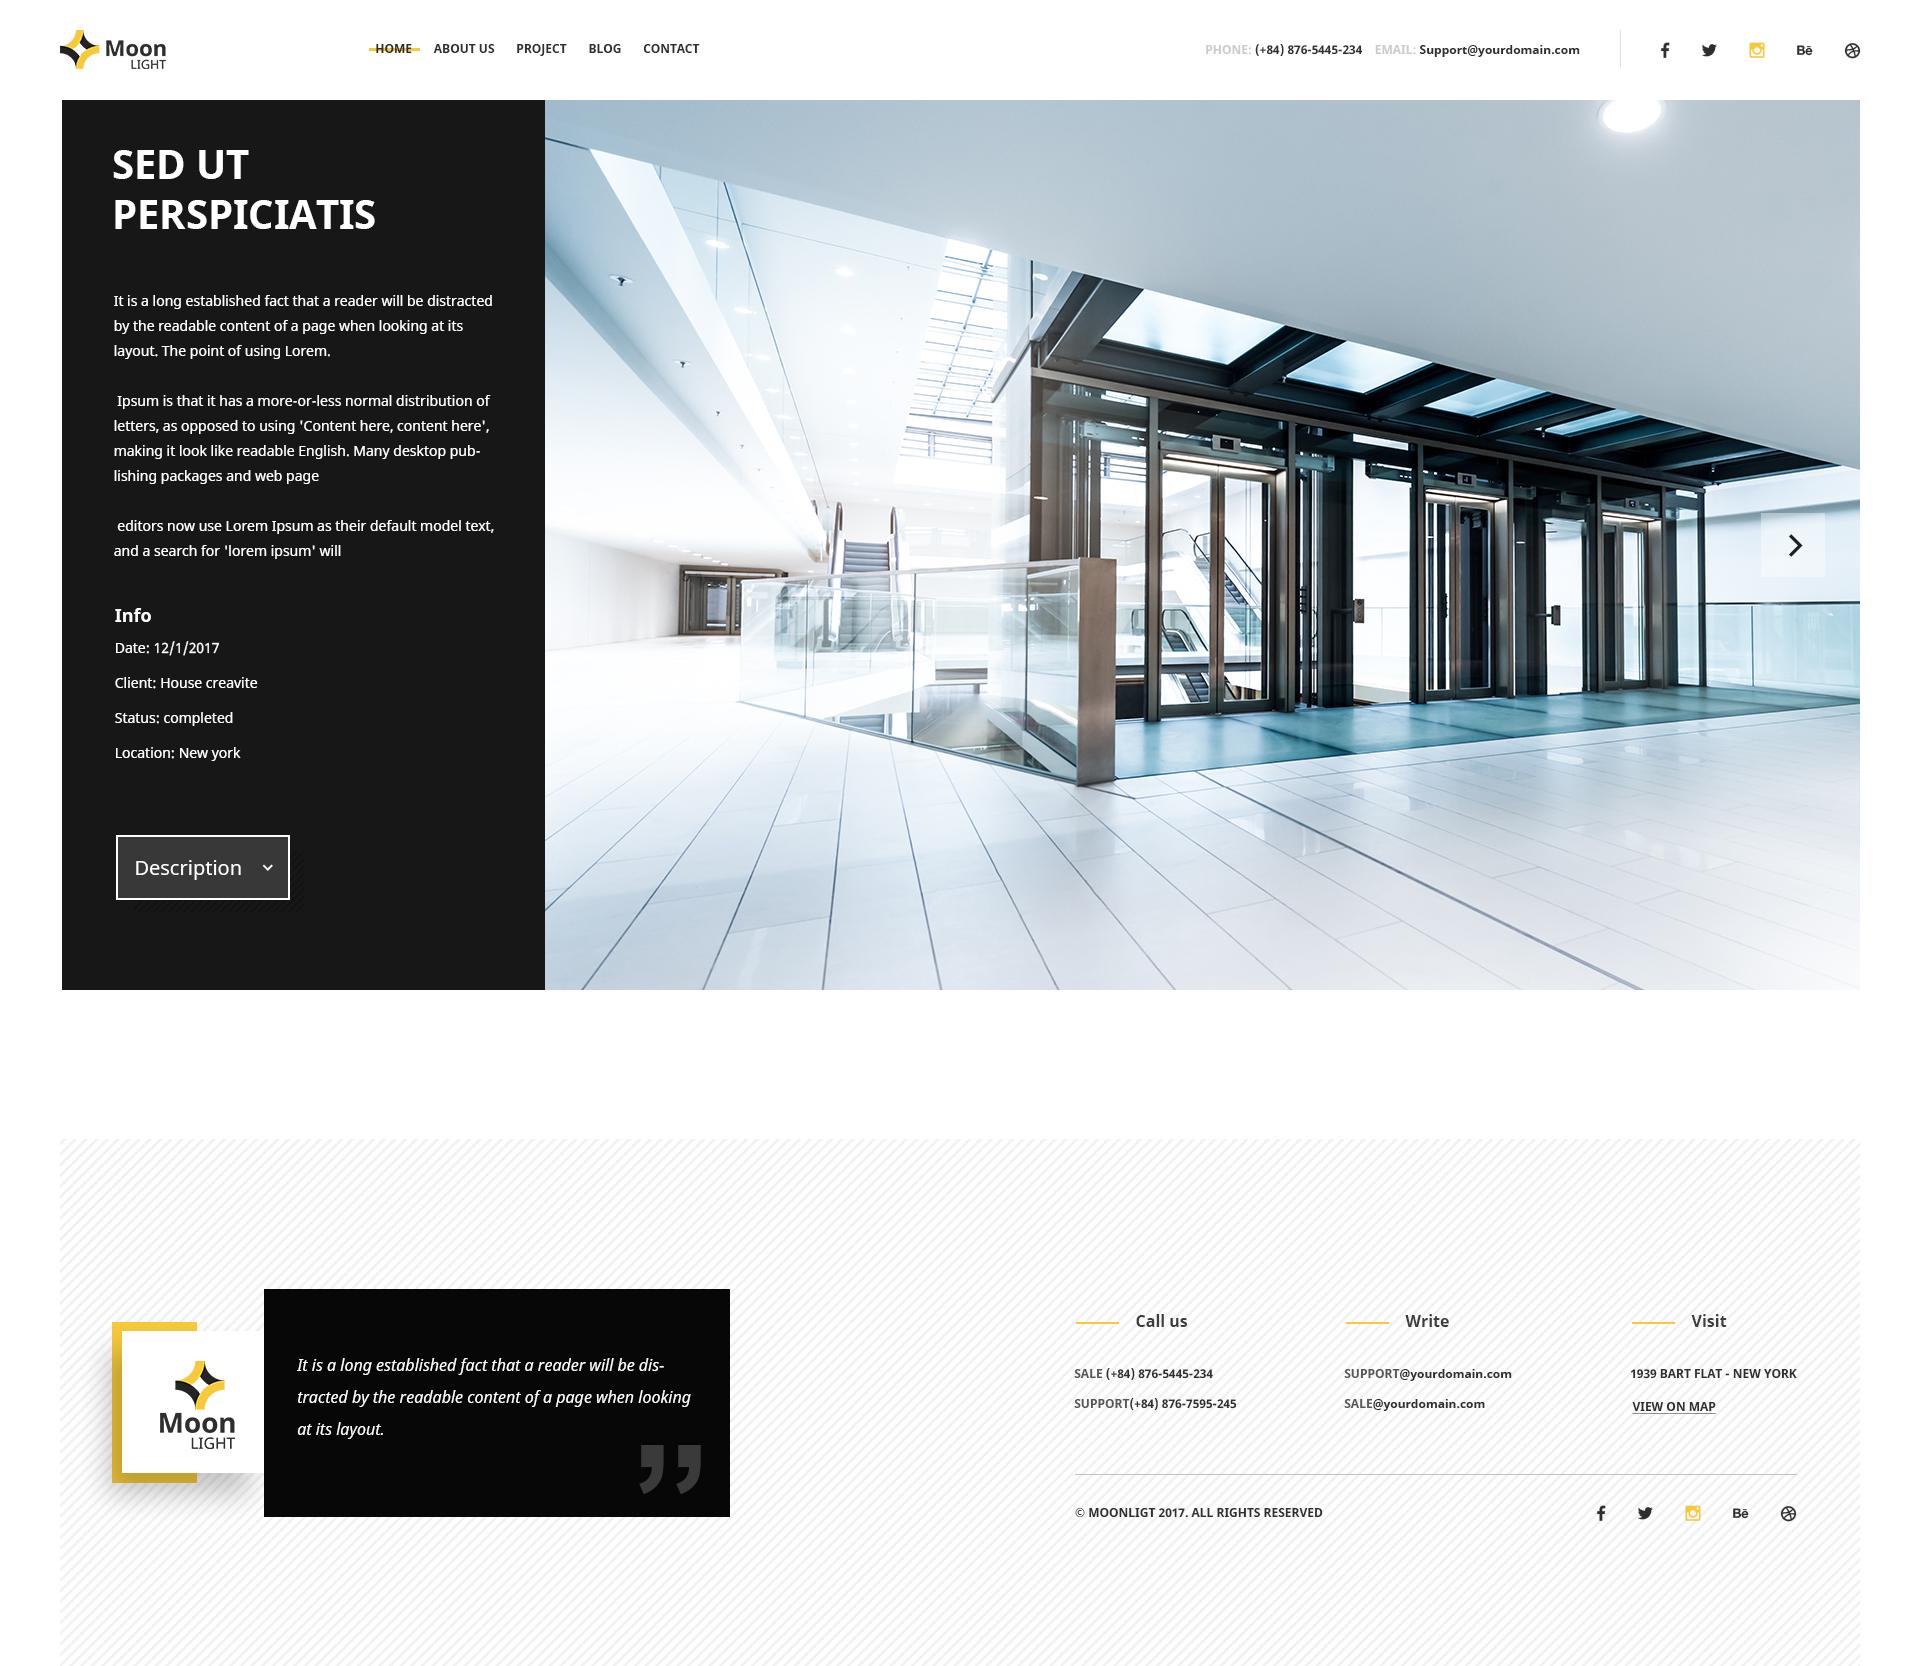 Moonlight - Architecture, Decor & Interior Design PSD Template